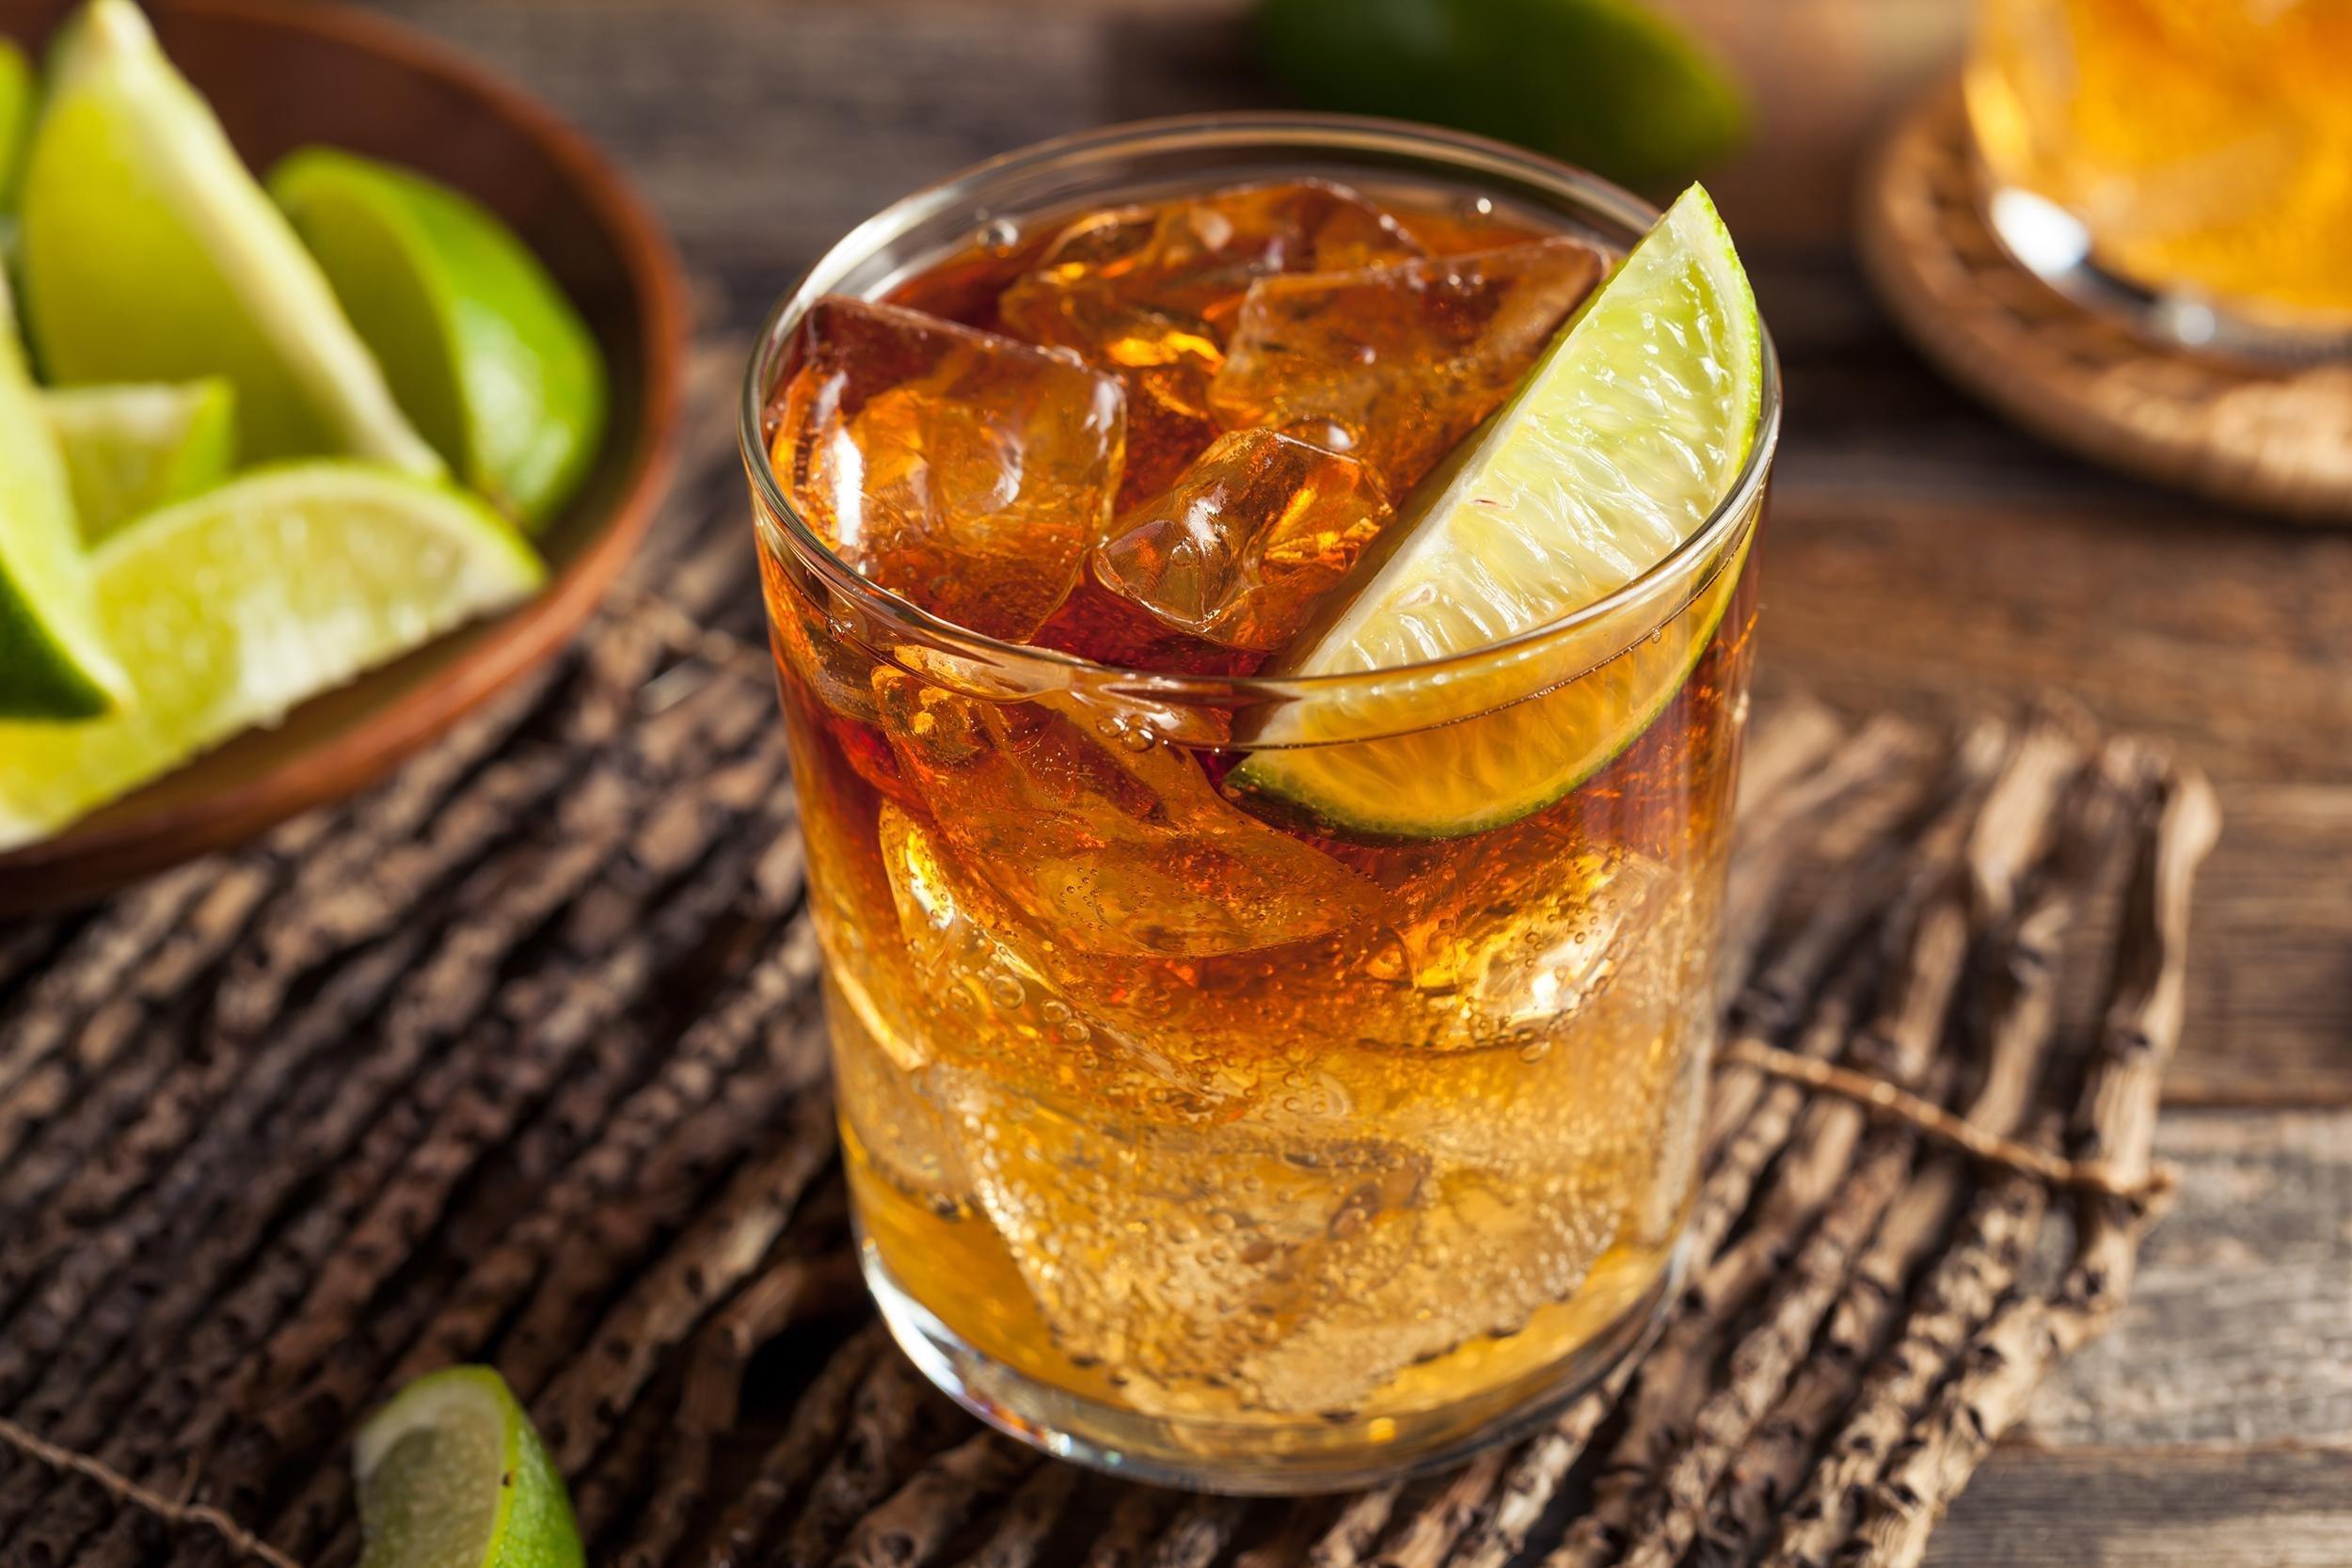 407-20160429-043419-4290-042616_best_tequila_dr.original.jpg